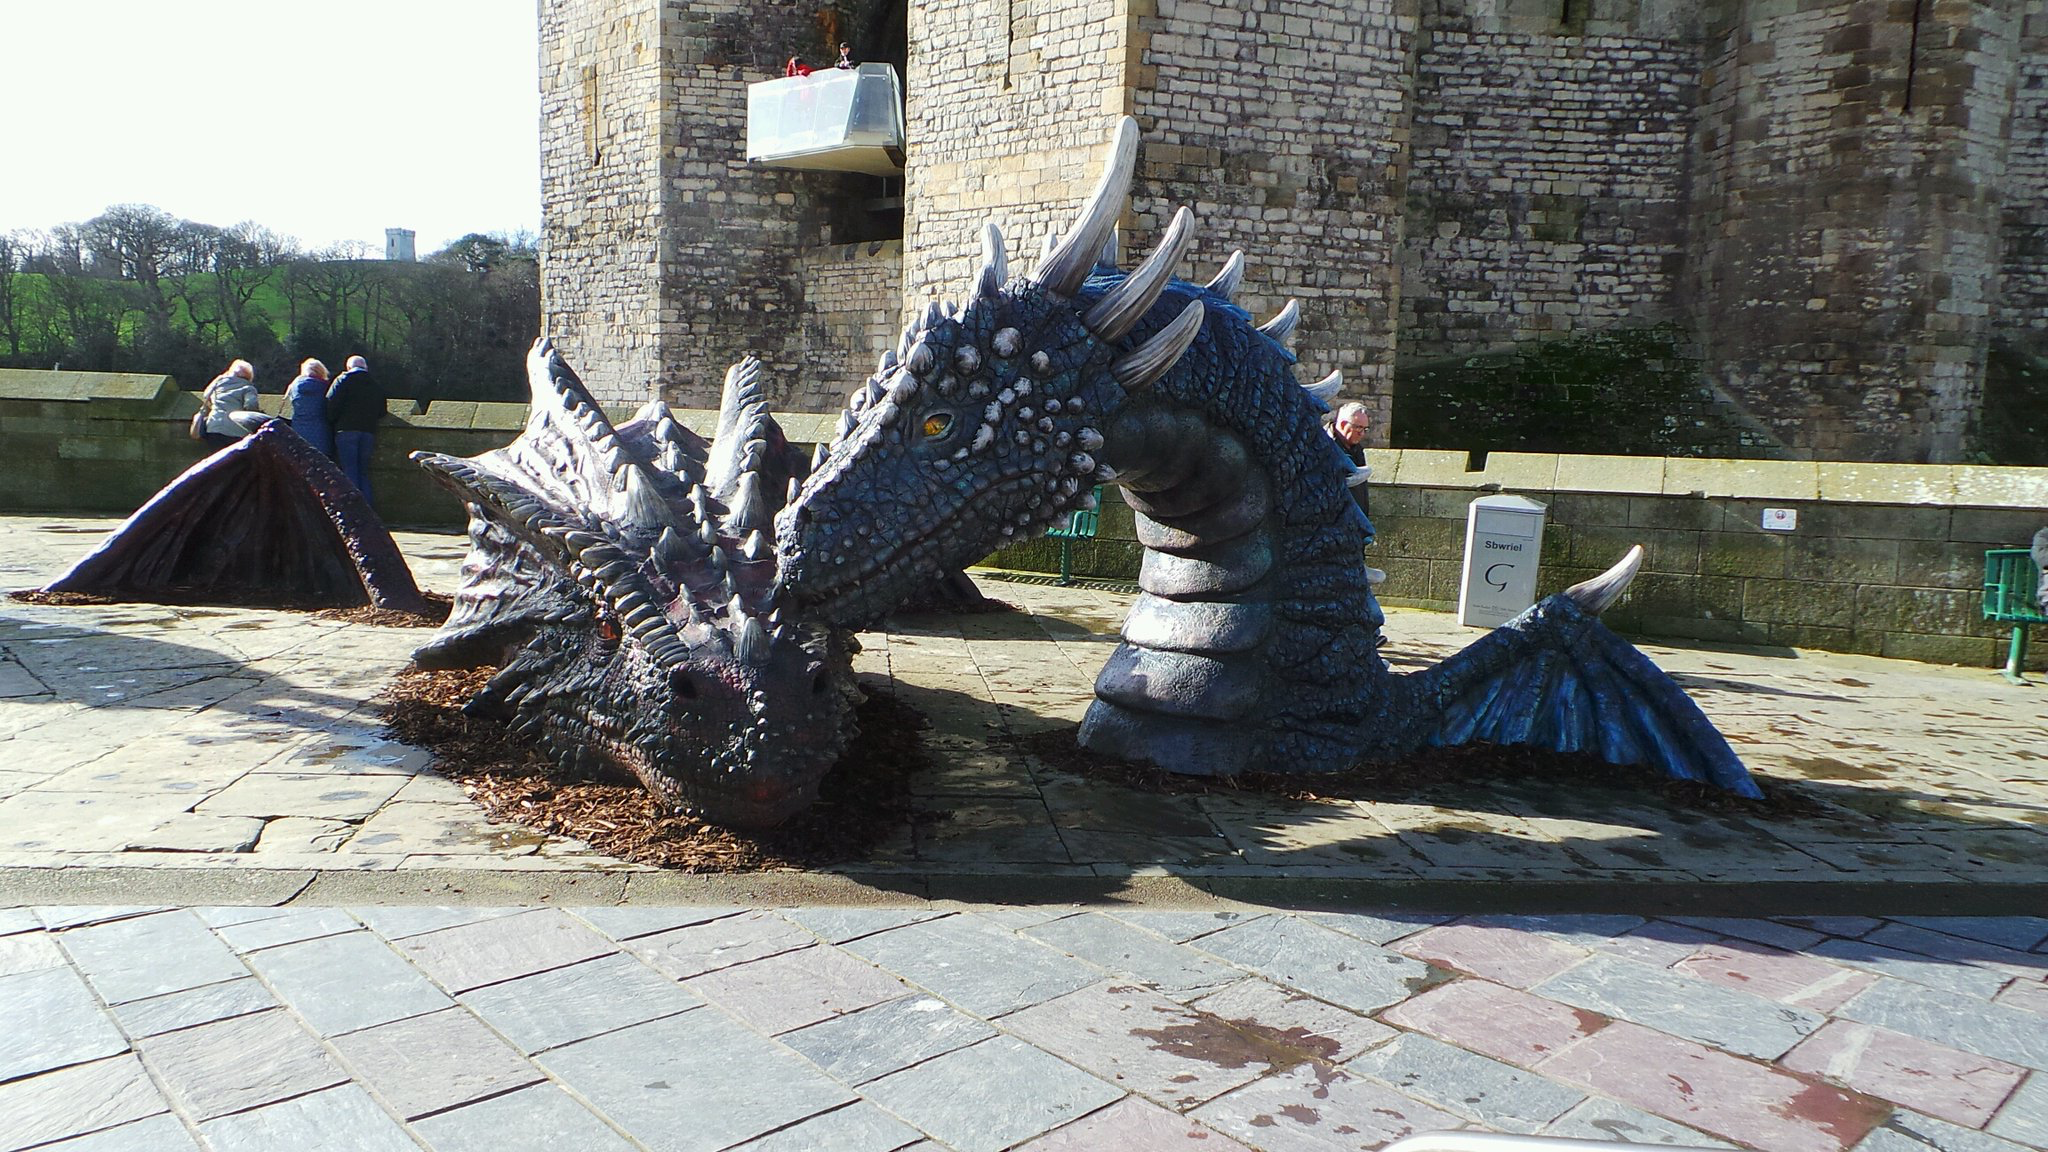 Meet Dwynwen Caernarfon S New Resident Dragon Named After Wales Patron Saint Of Love Wales Travel Welsh Ancestry Pembrokeshire [ 1152 x 2048 Pixel ]